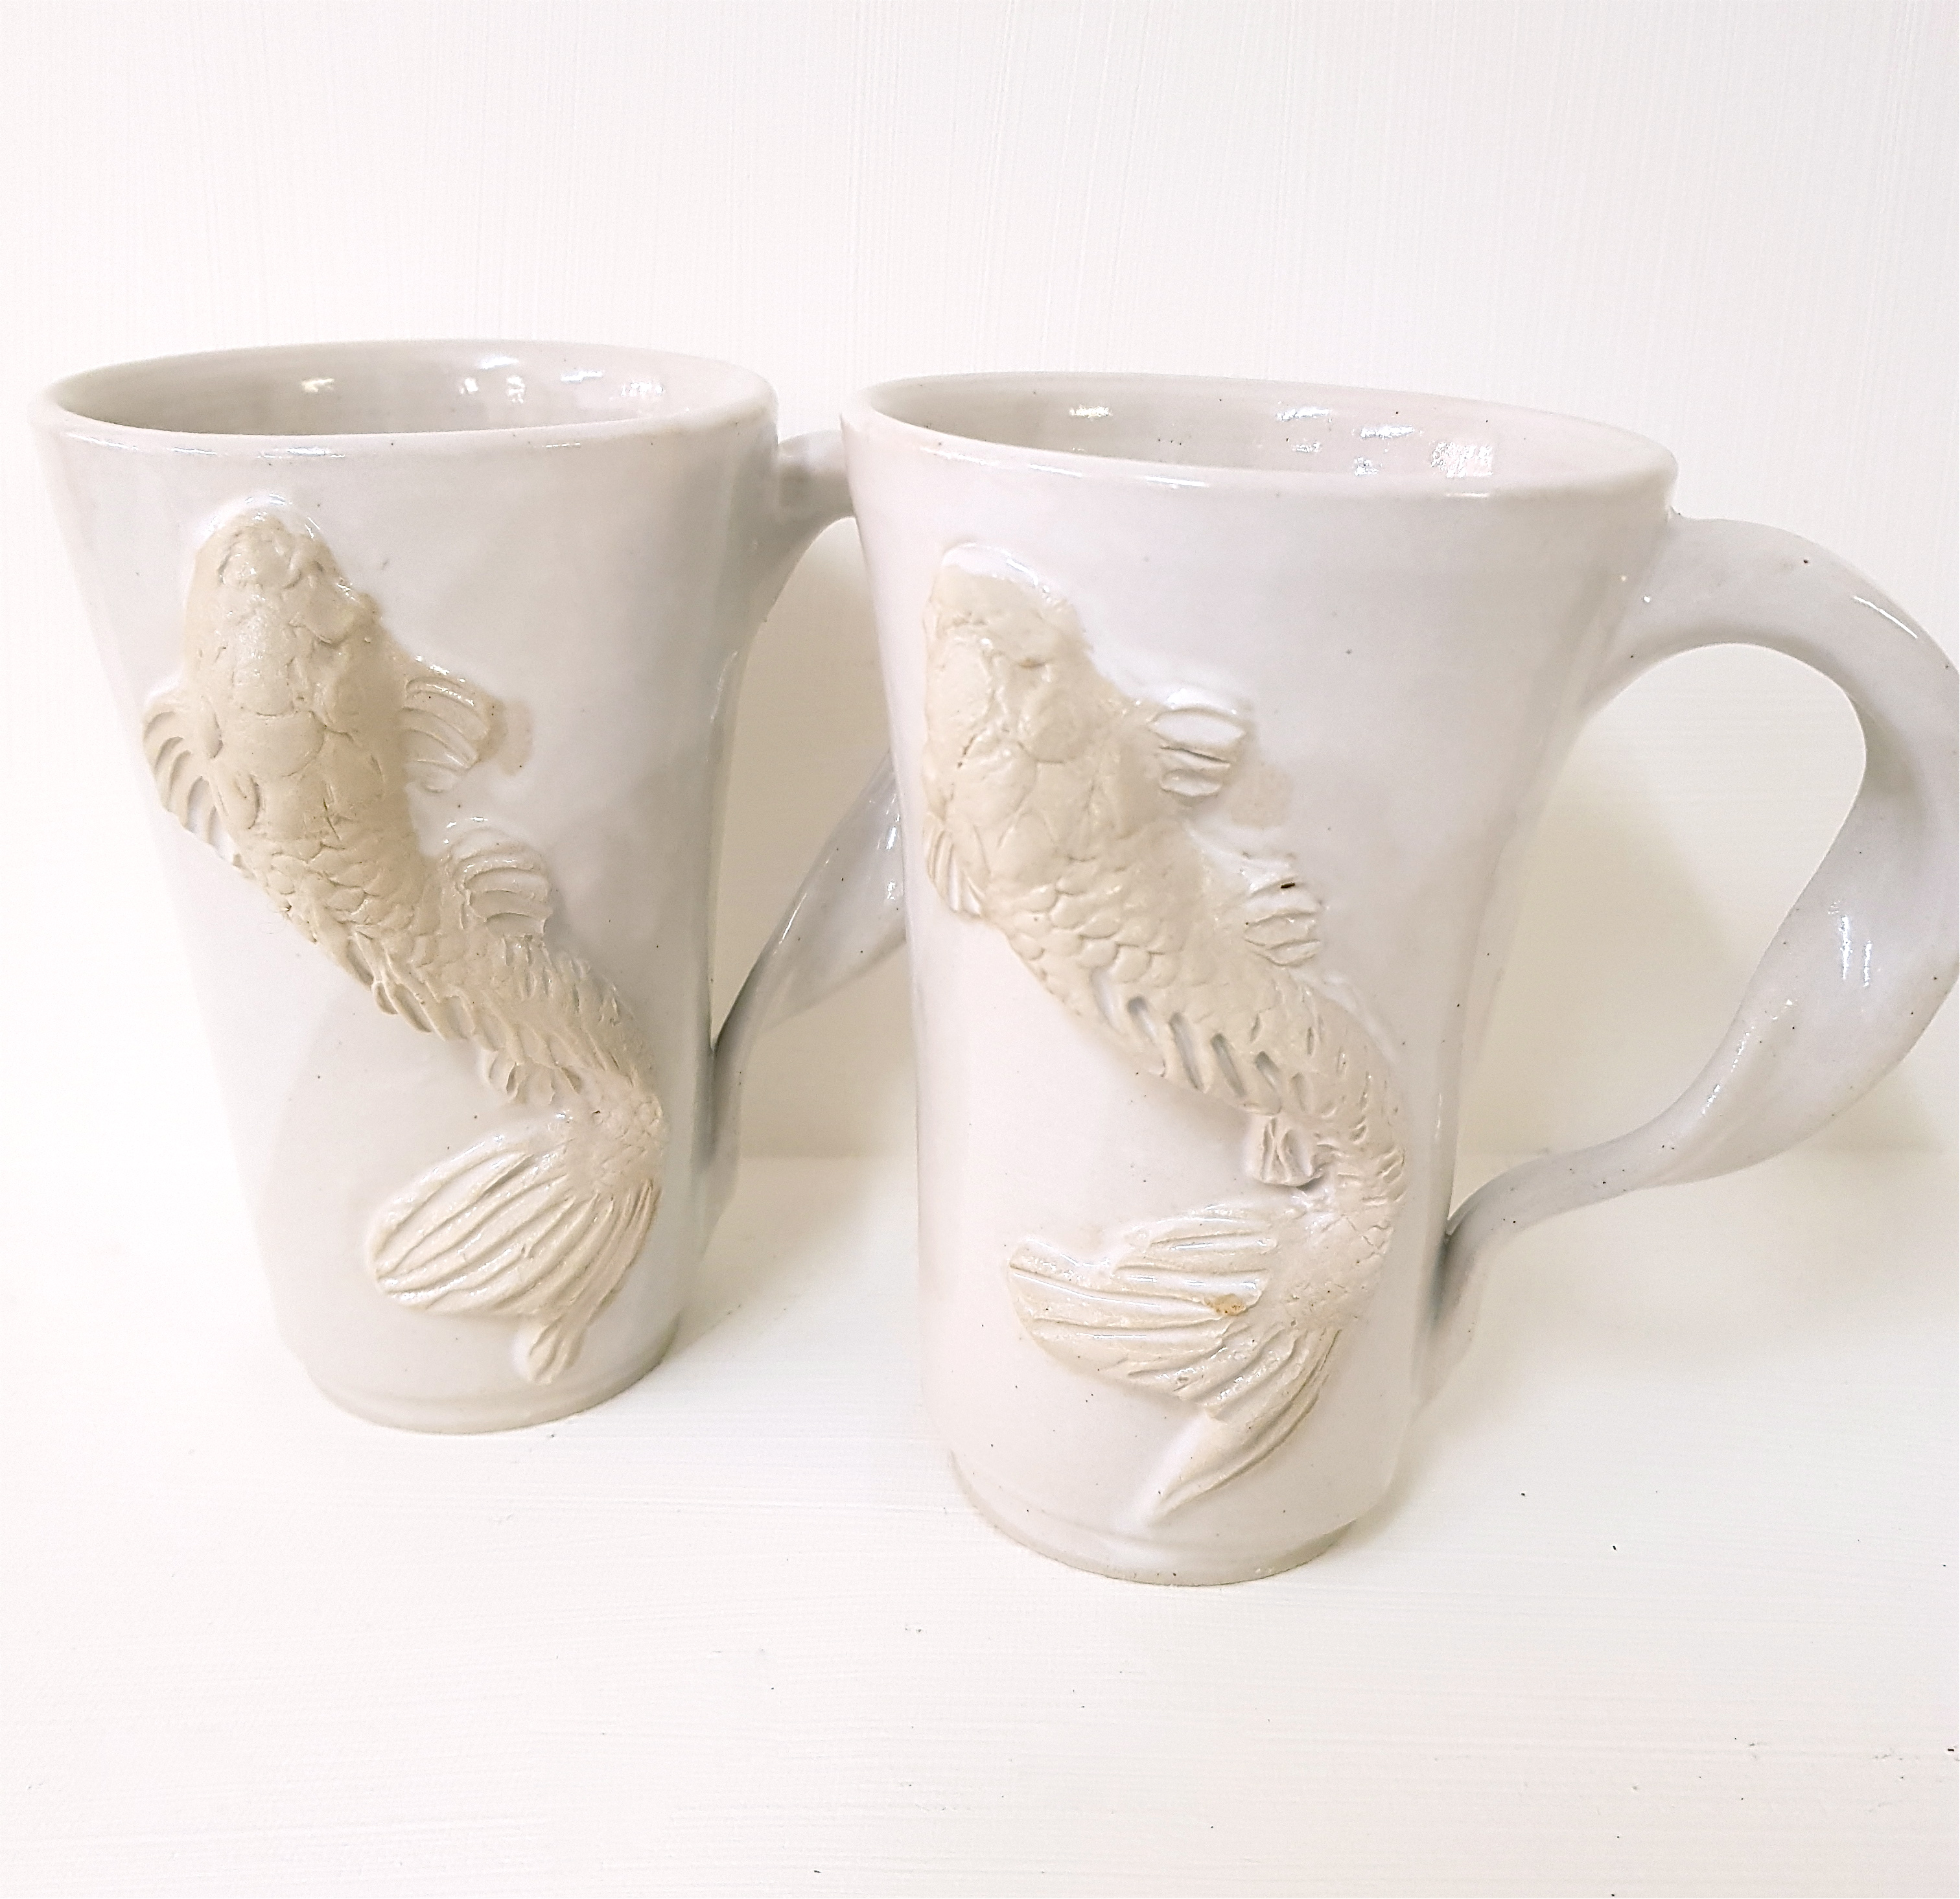 "Henkeltasse ""KOI"", Unikat, Tasse, Keramik, Steinzeug, töpfern"